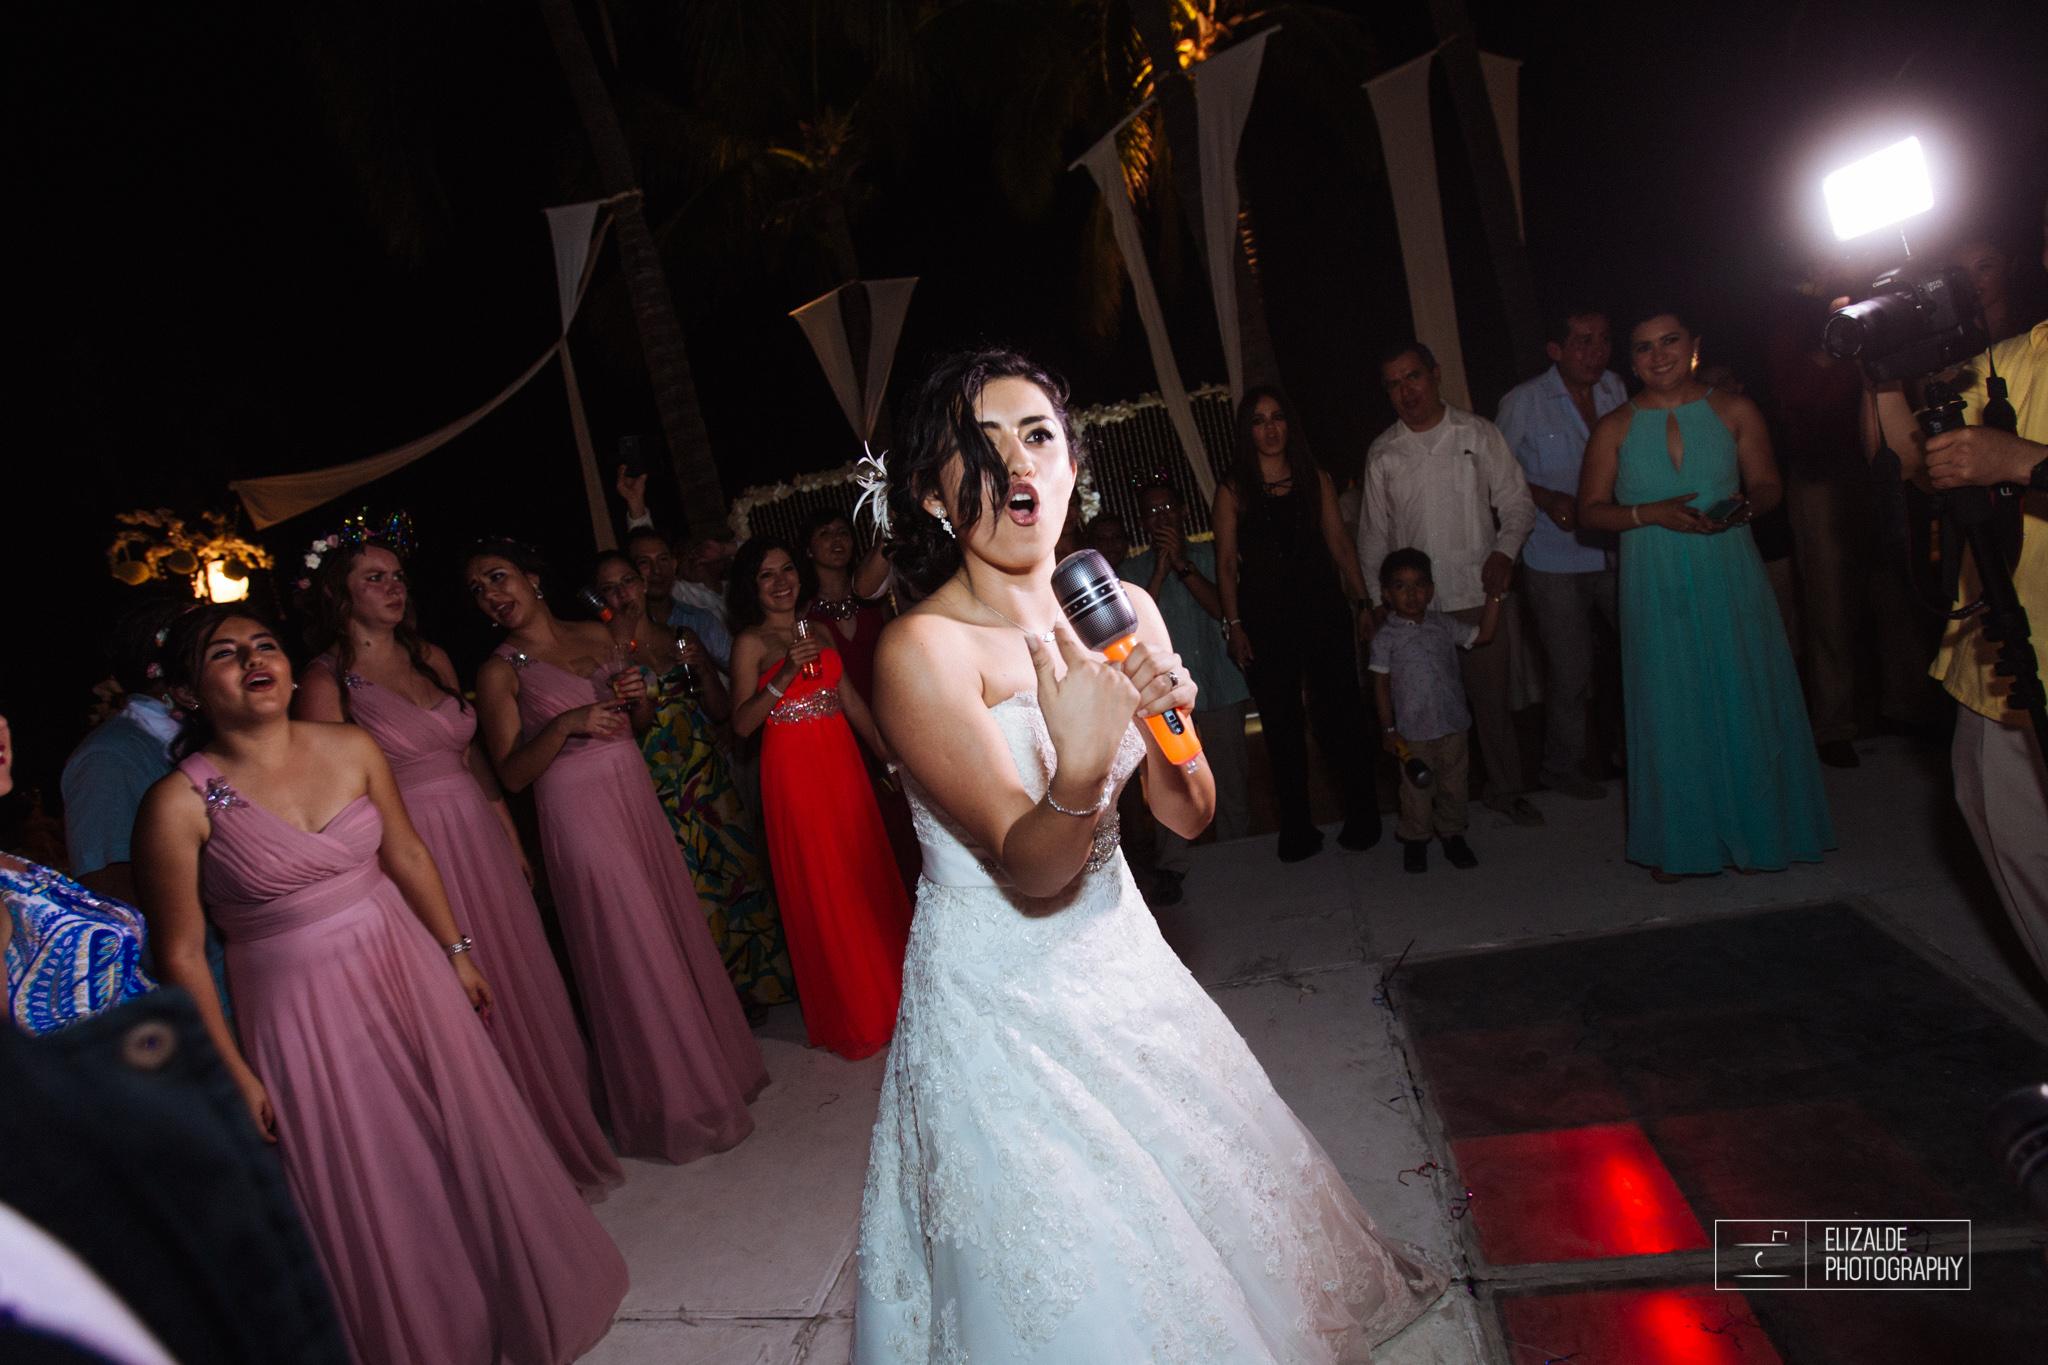 Pay and Ferran_Acapulco_Destination Wedding_Elizalde Photography-157.jpg